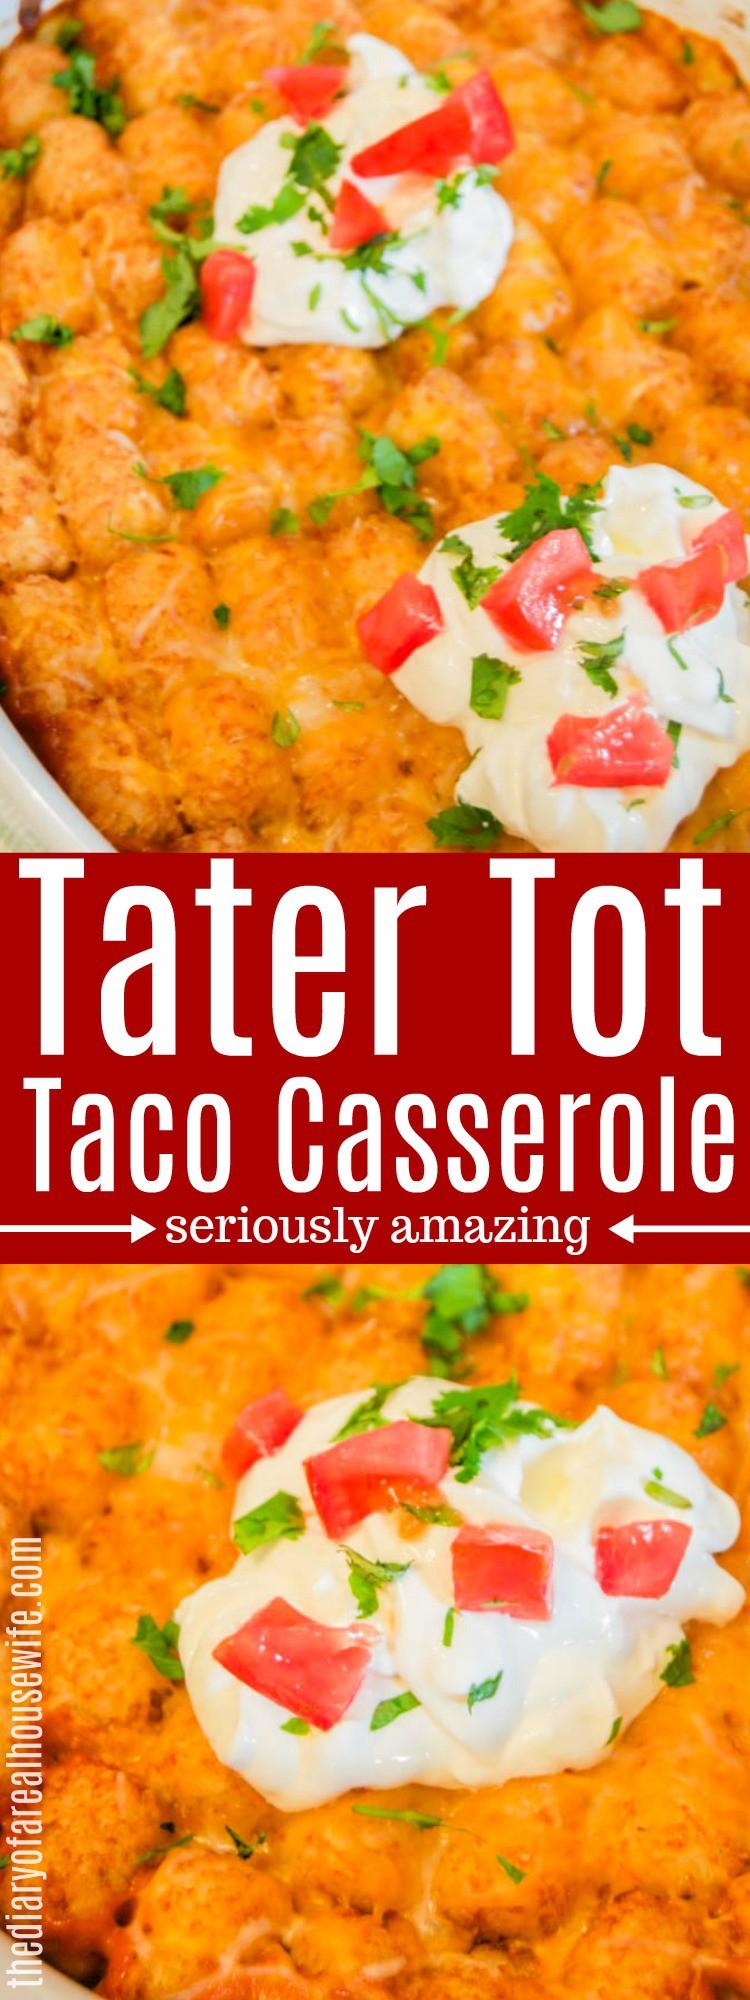 Tater Tot Taco Casserole